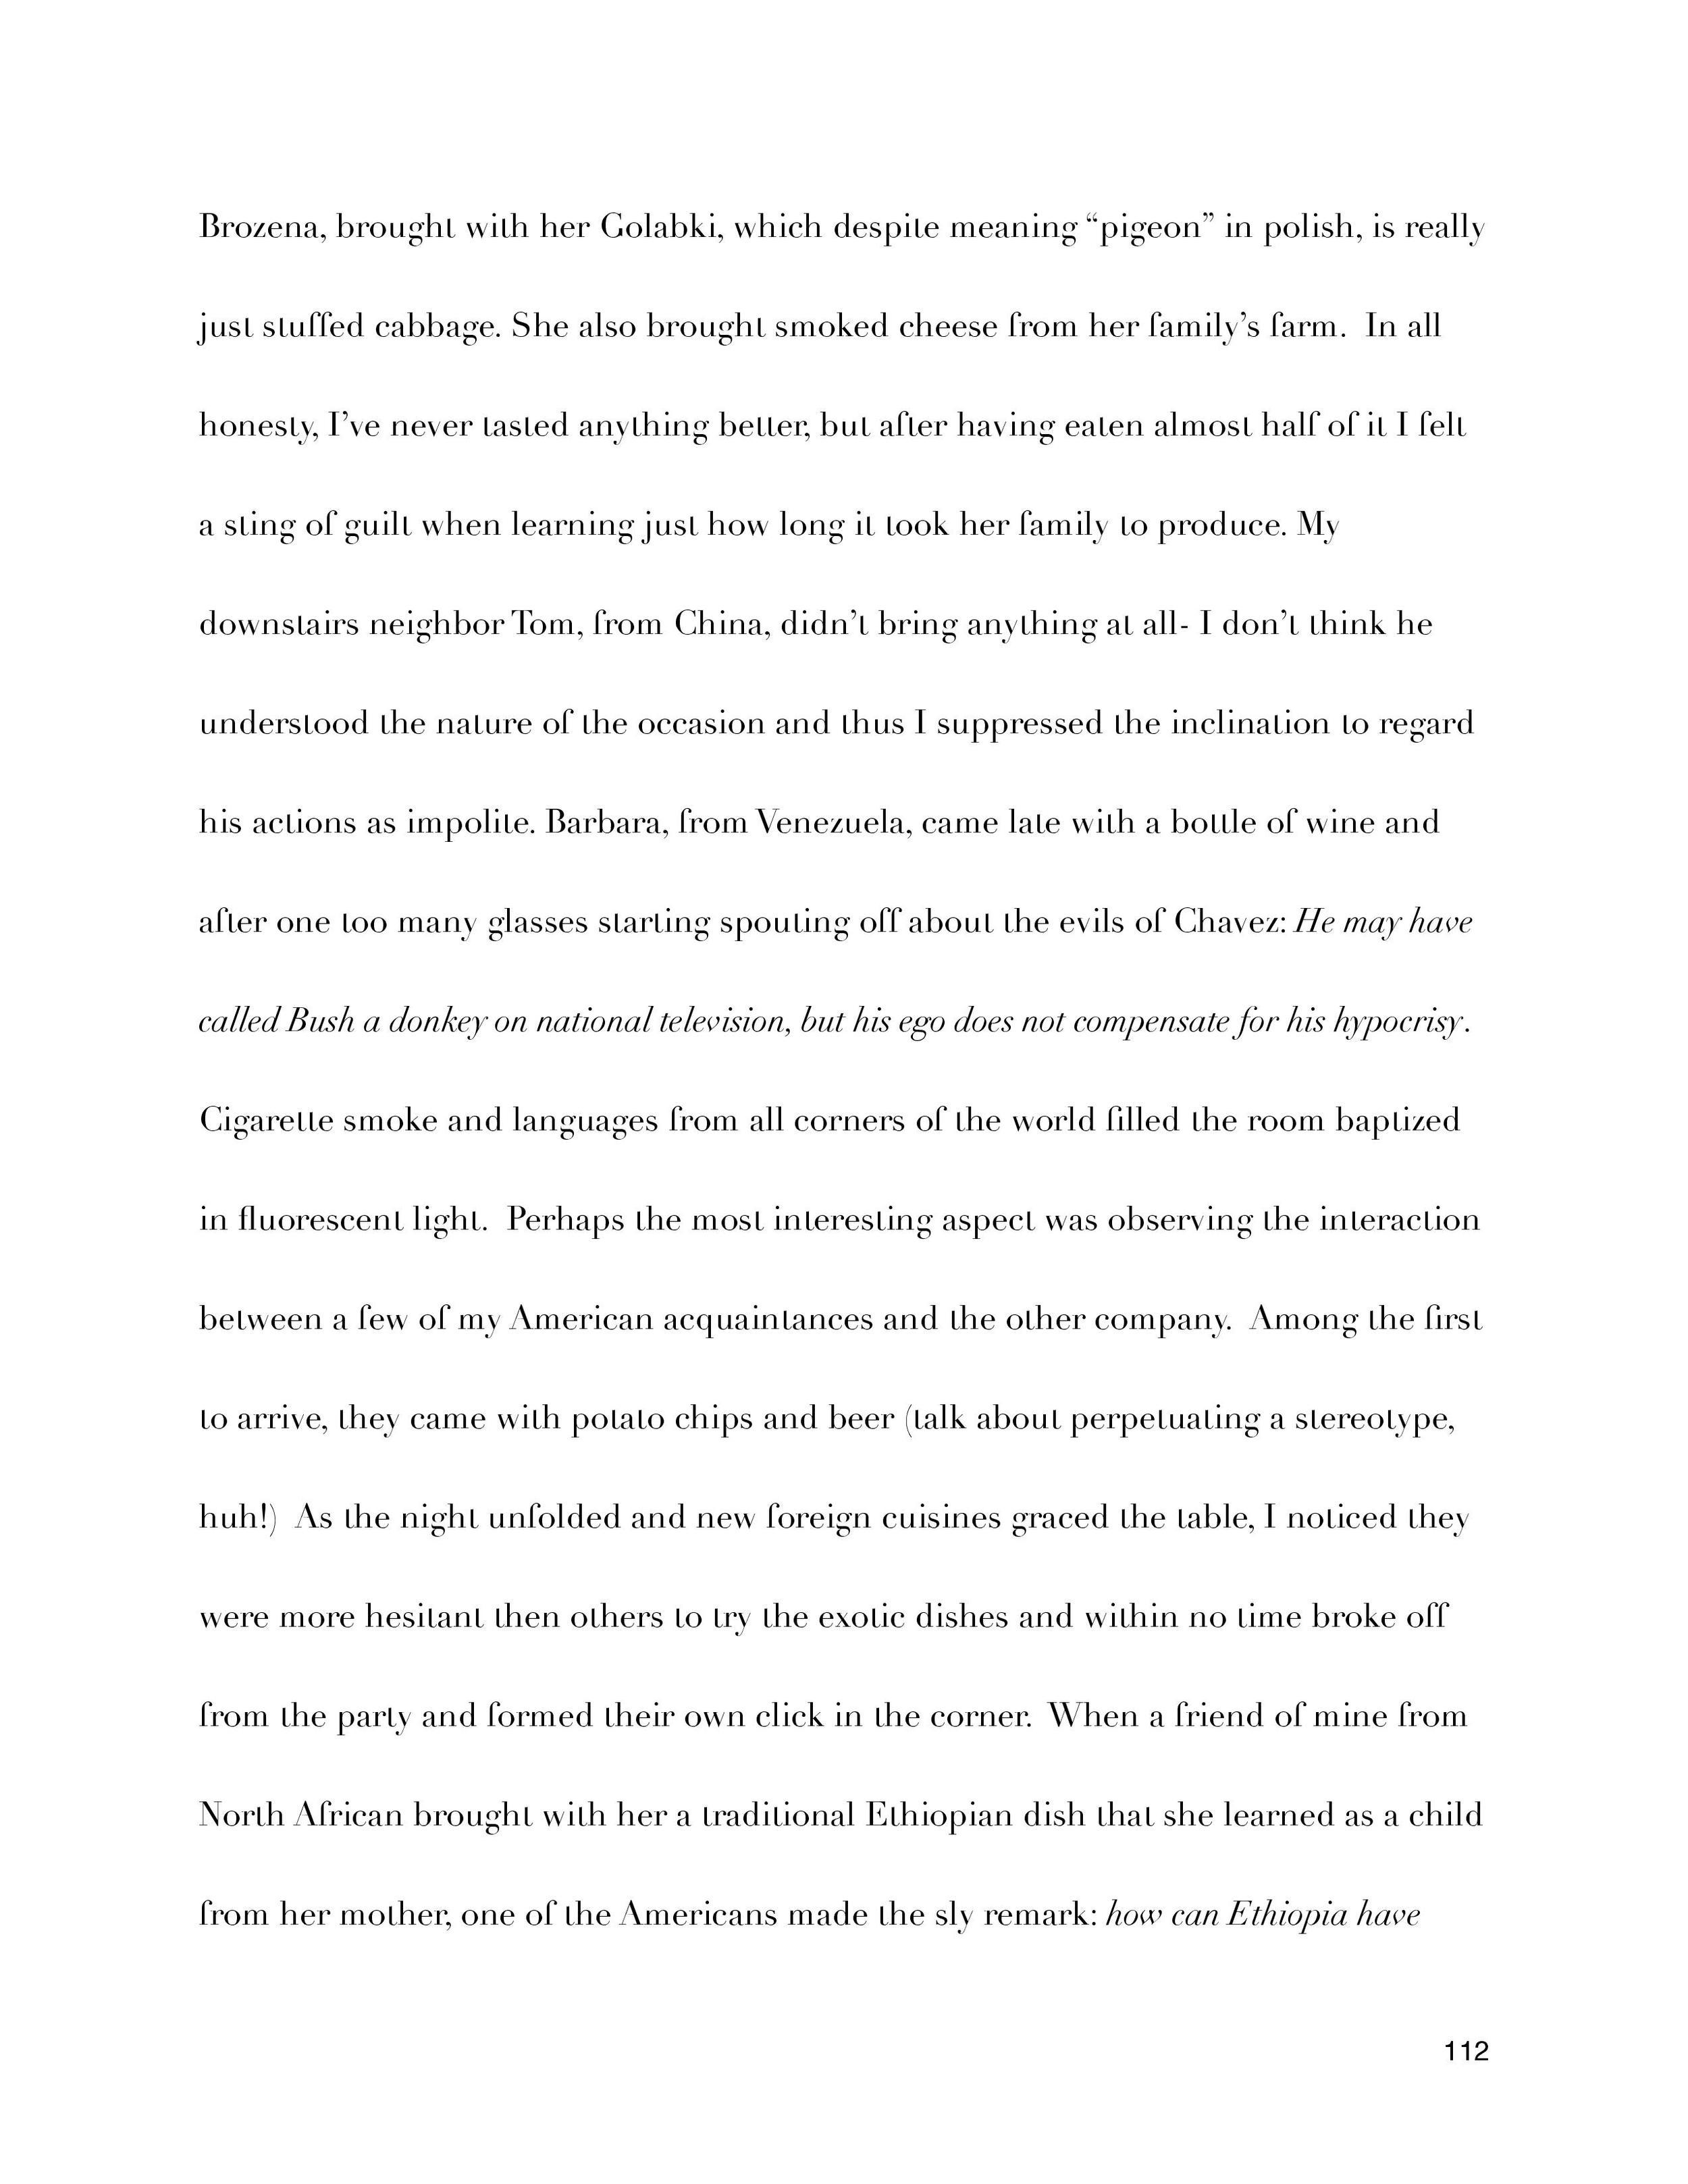 ShatteredGlass-page-113.jpg